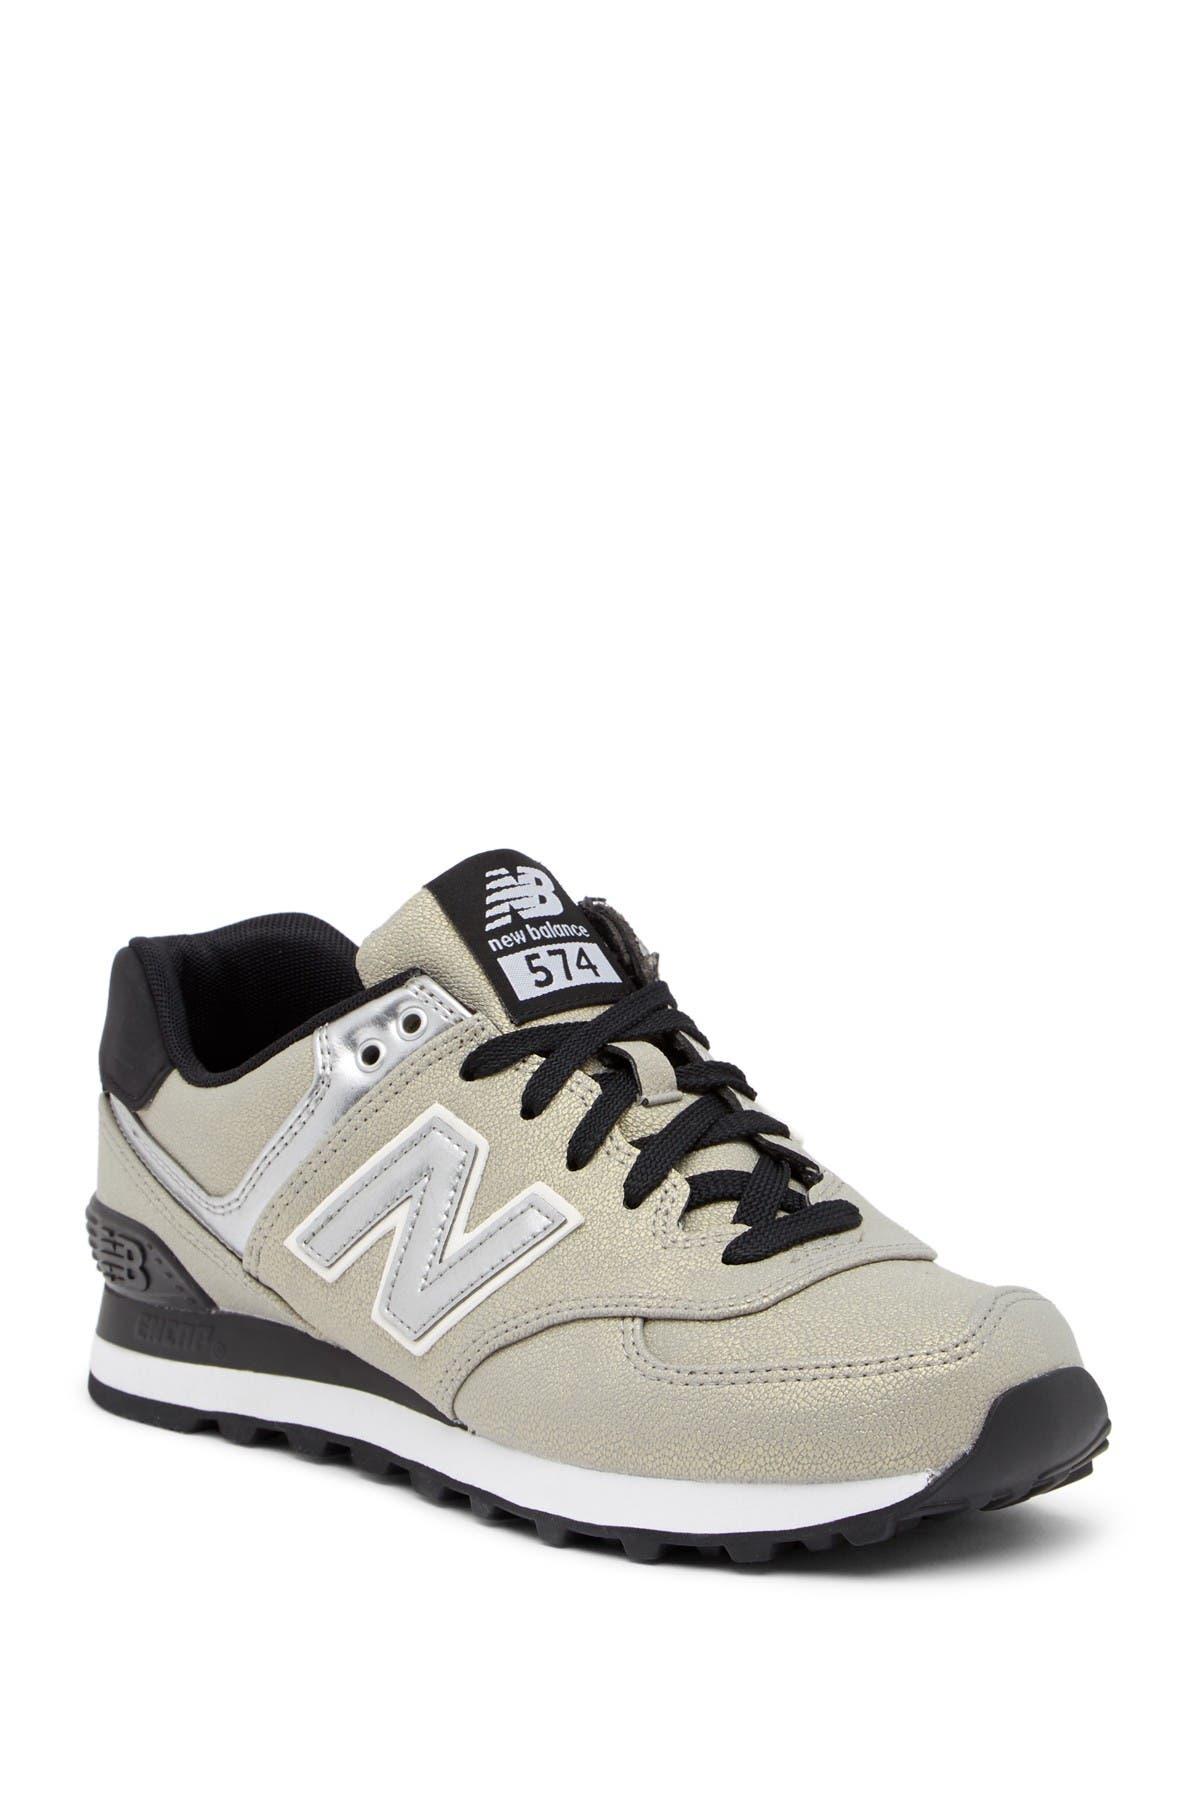 574 Seasonal Shimmer Suede Sneaker